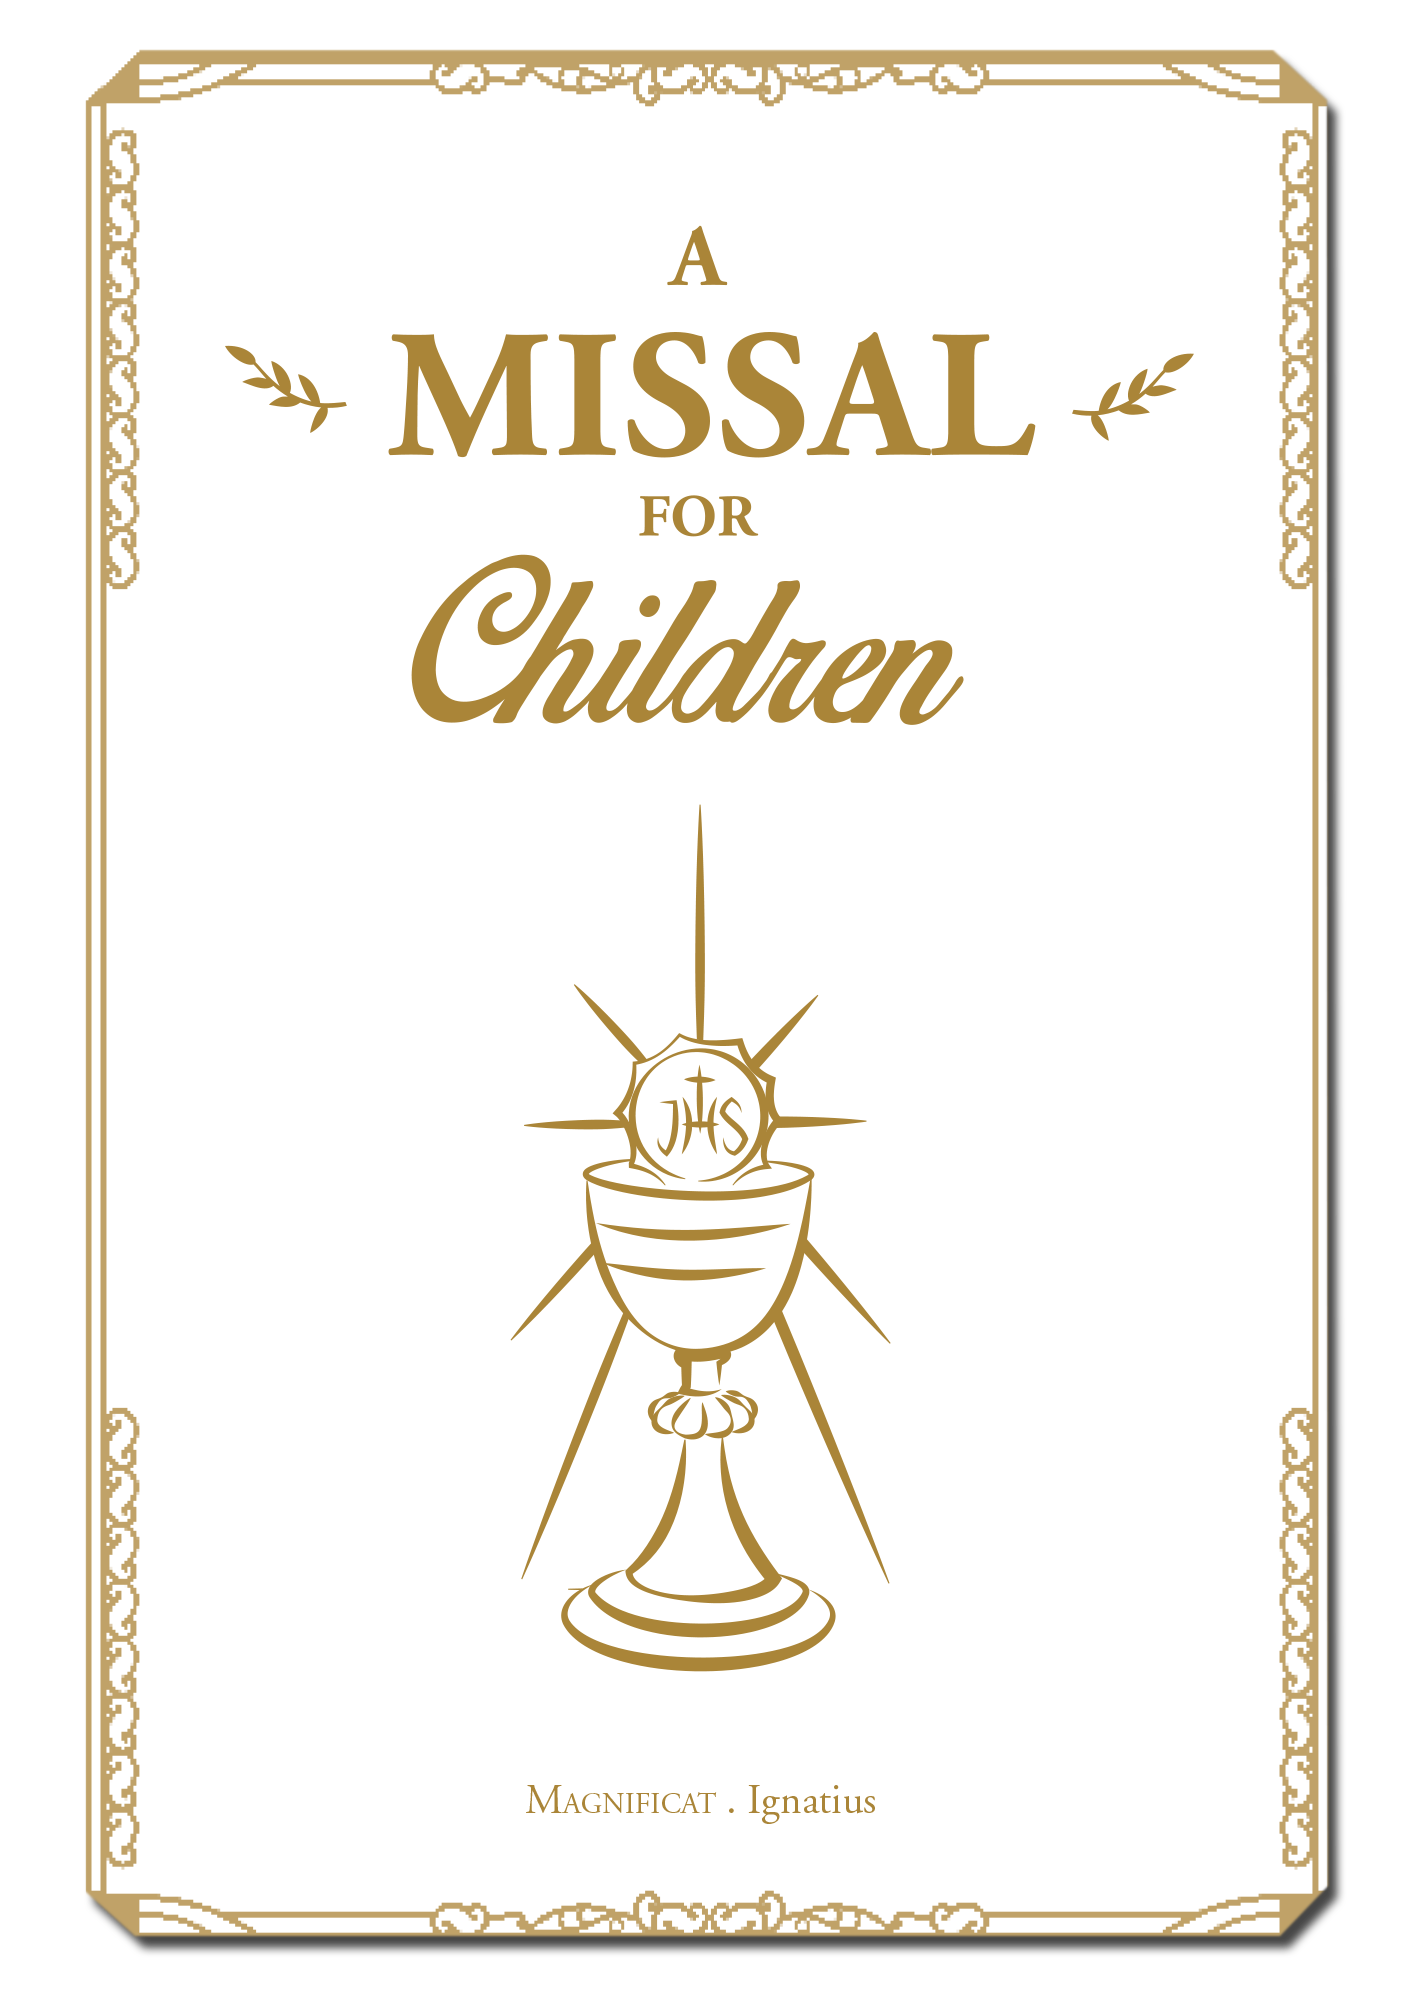 A Missal For Children